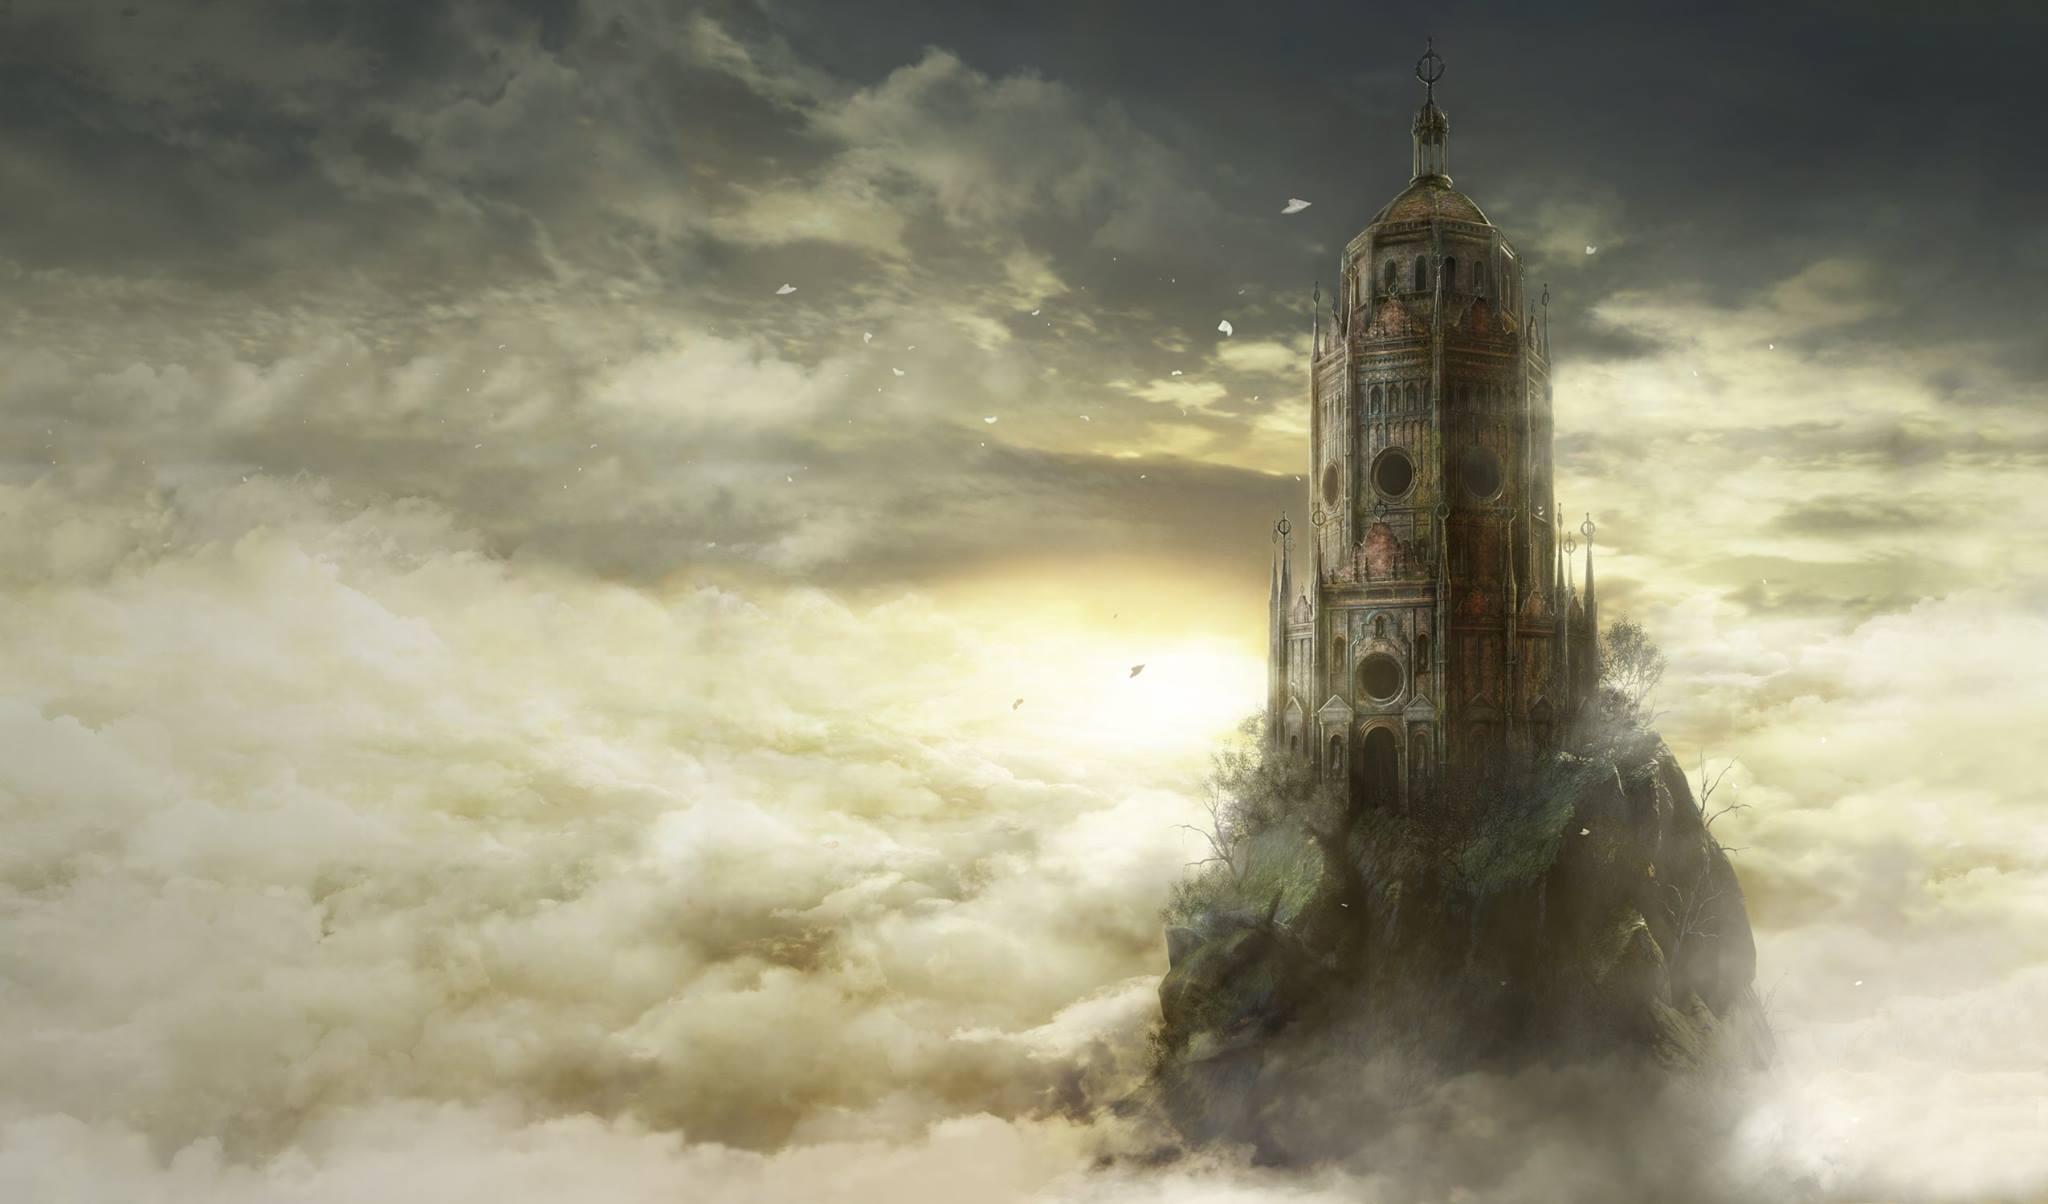 Obrazem: Dark Souls 3: The Ringed City 137248